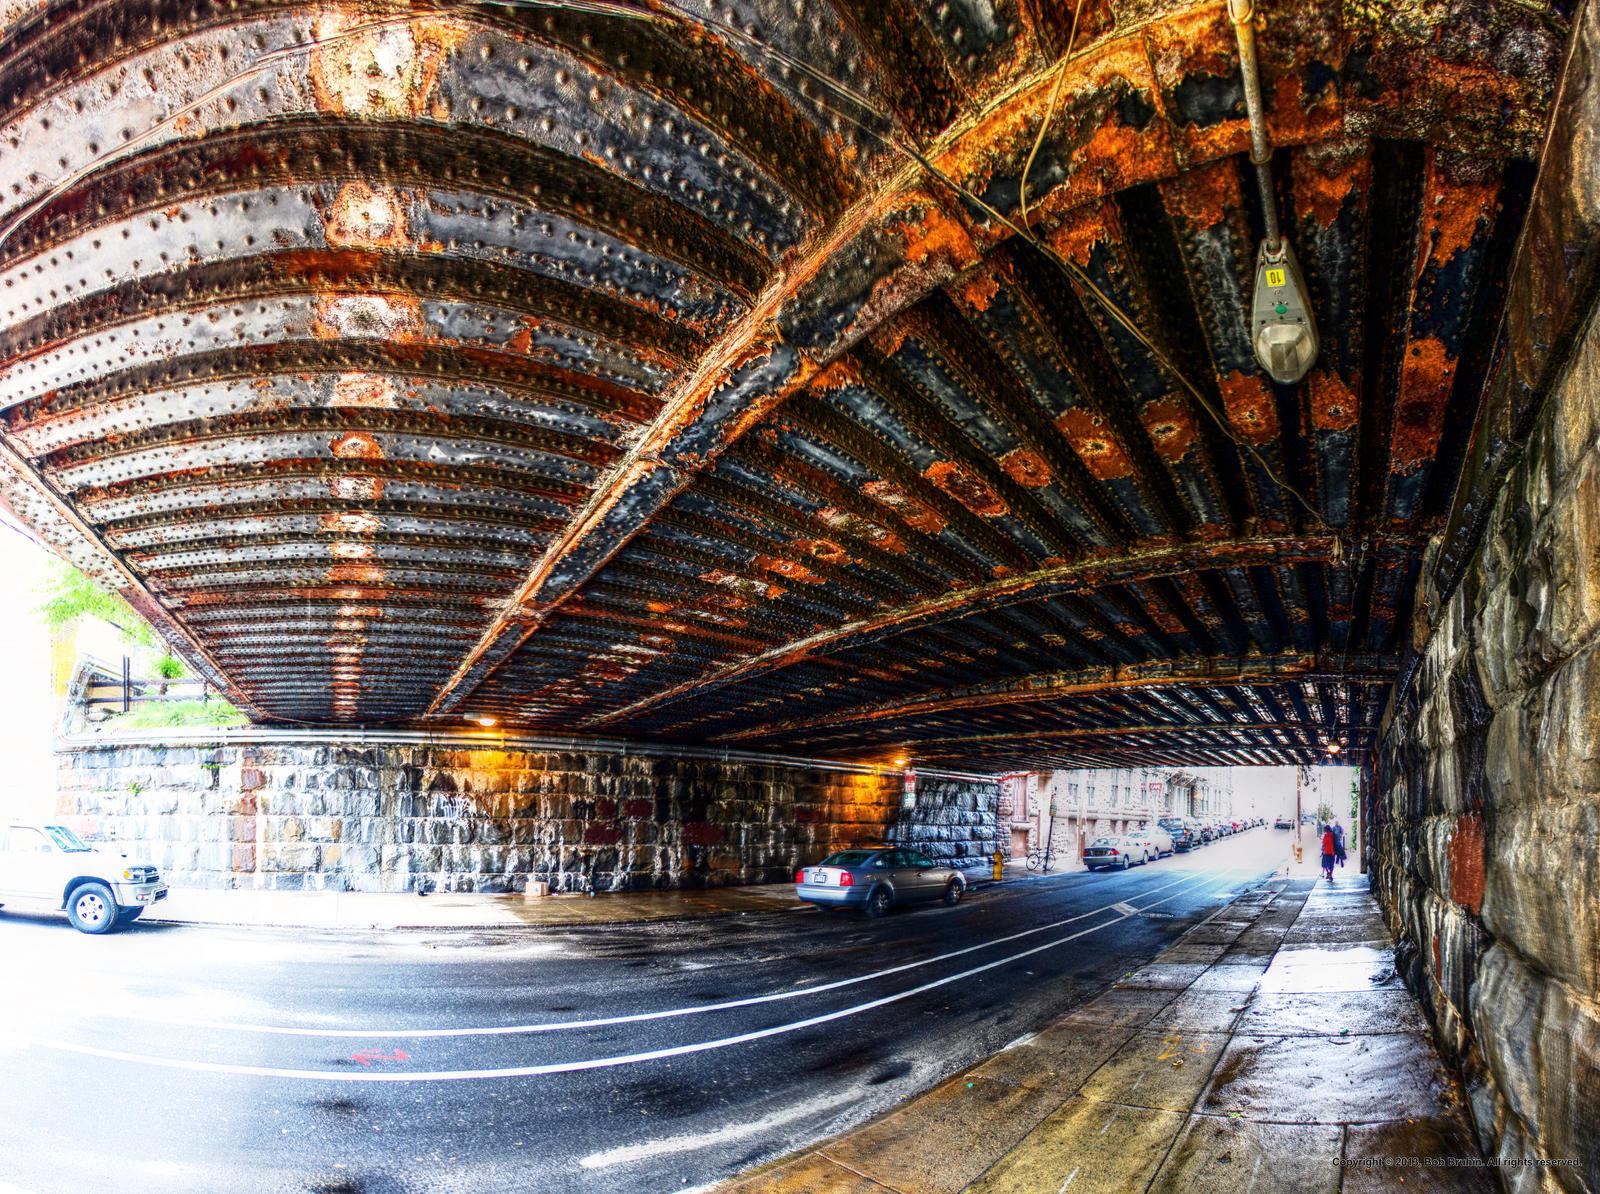 Panorama 2295 blended fused pregamma 1 mantiuk06 c